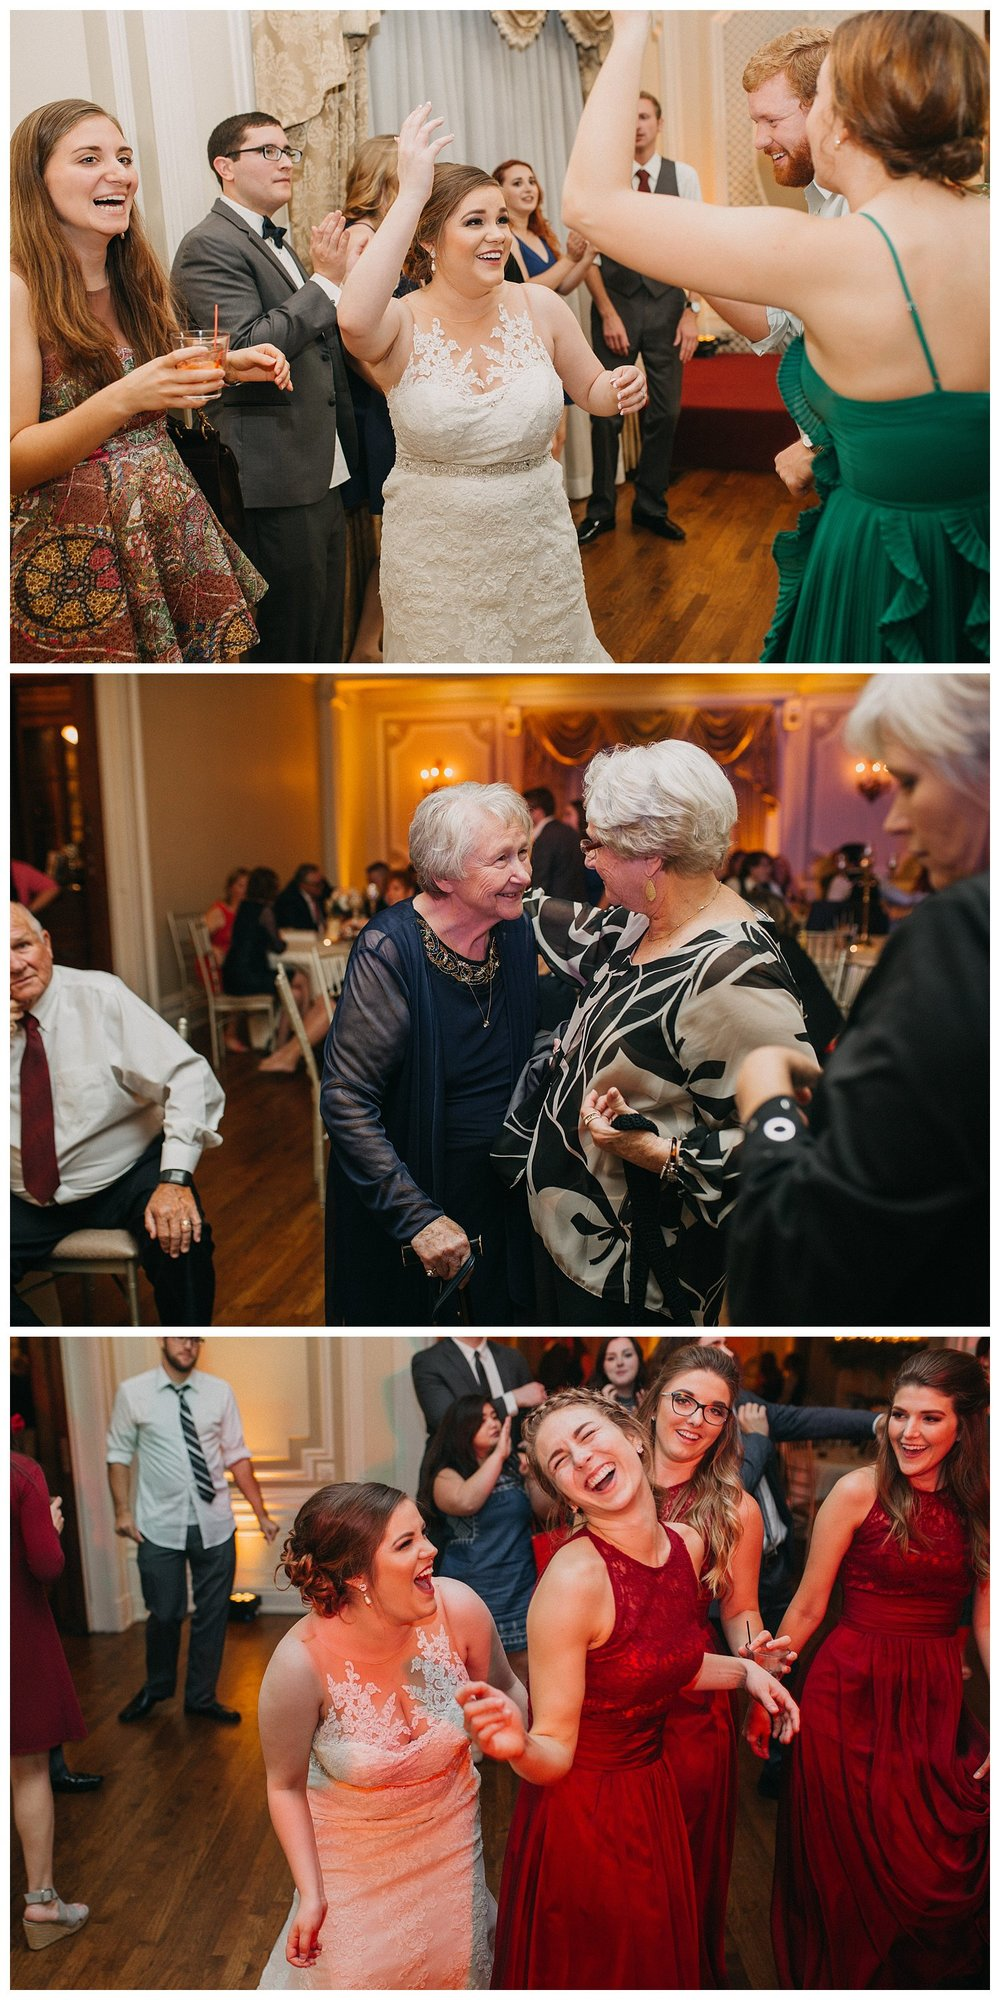 Kelsey_Diane_Photography_Loose_Mansion_Wedding_Photography_Kansas_City_Victor_Lyndsay_0175.jpg